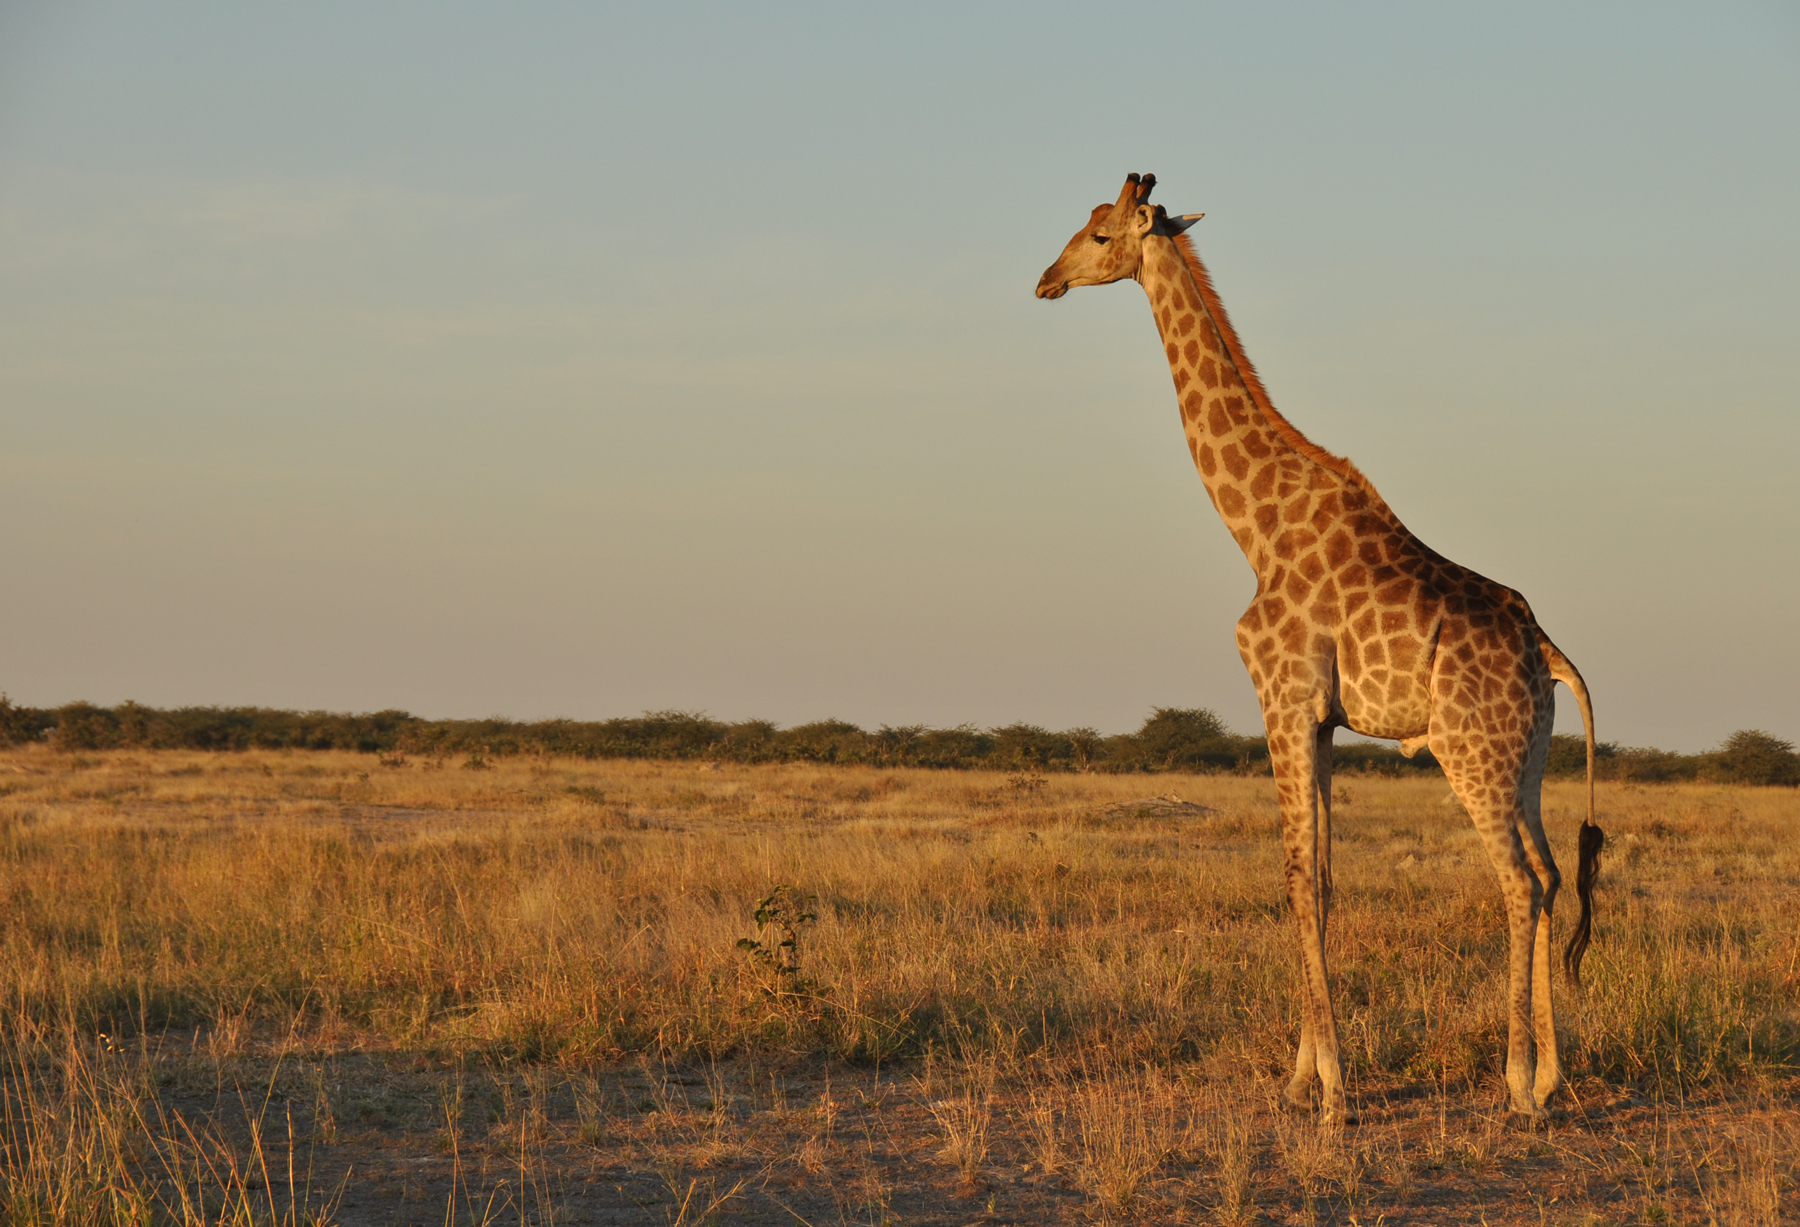 Our Botswana Safari Experience Review of Kalahari, Okavango